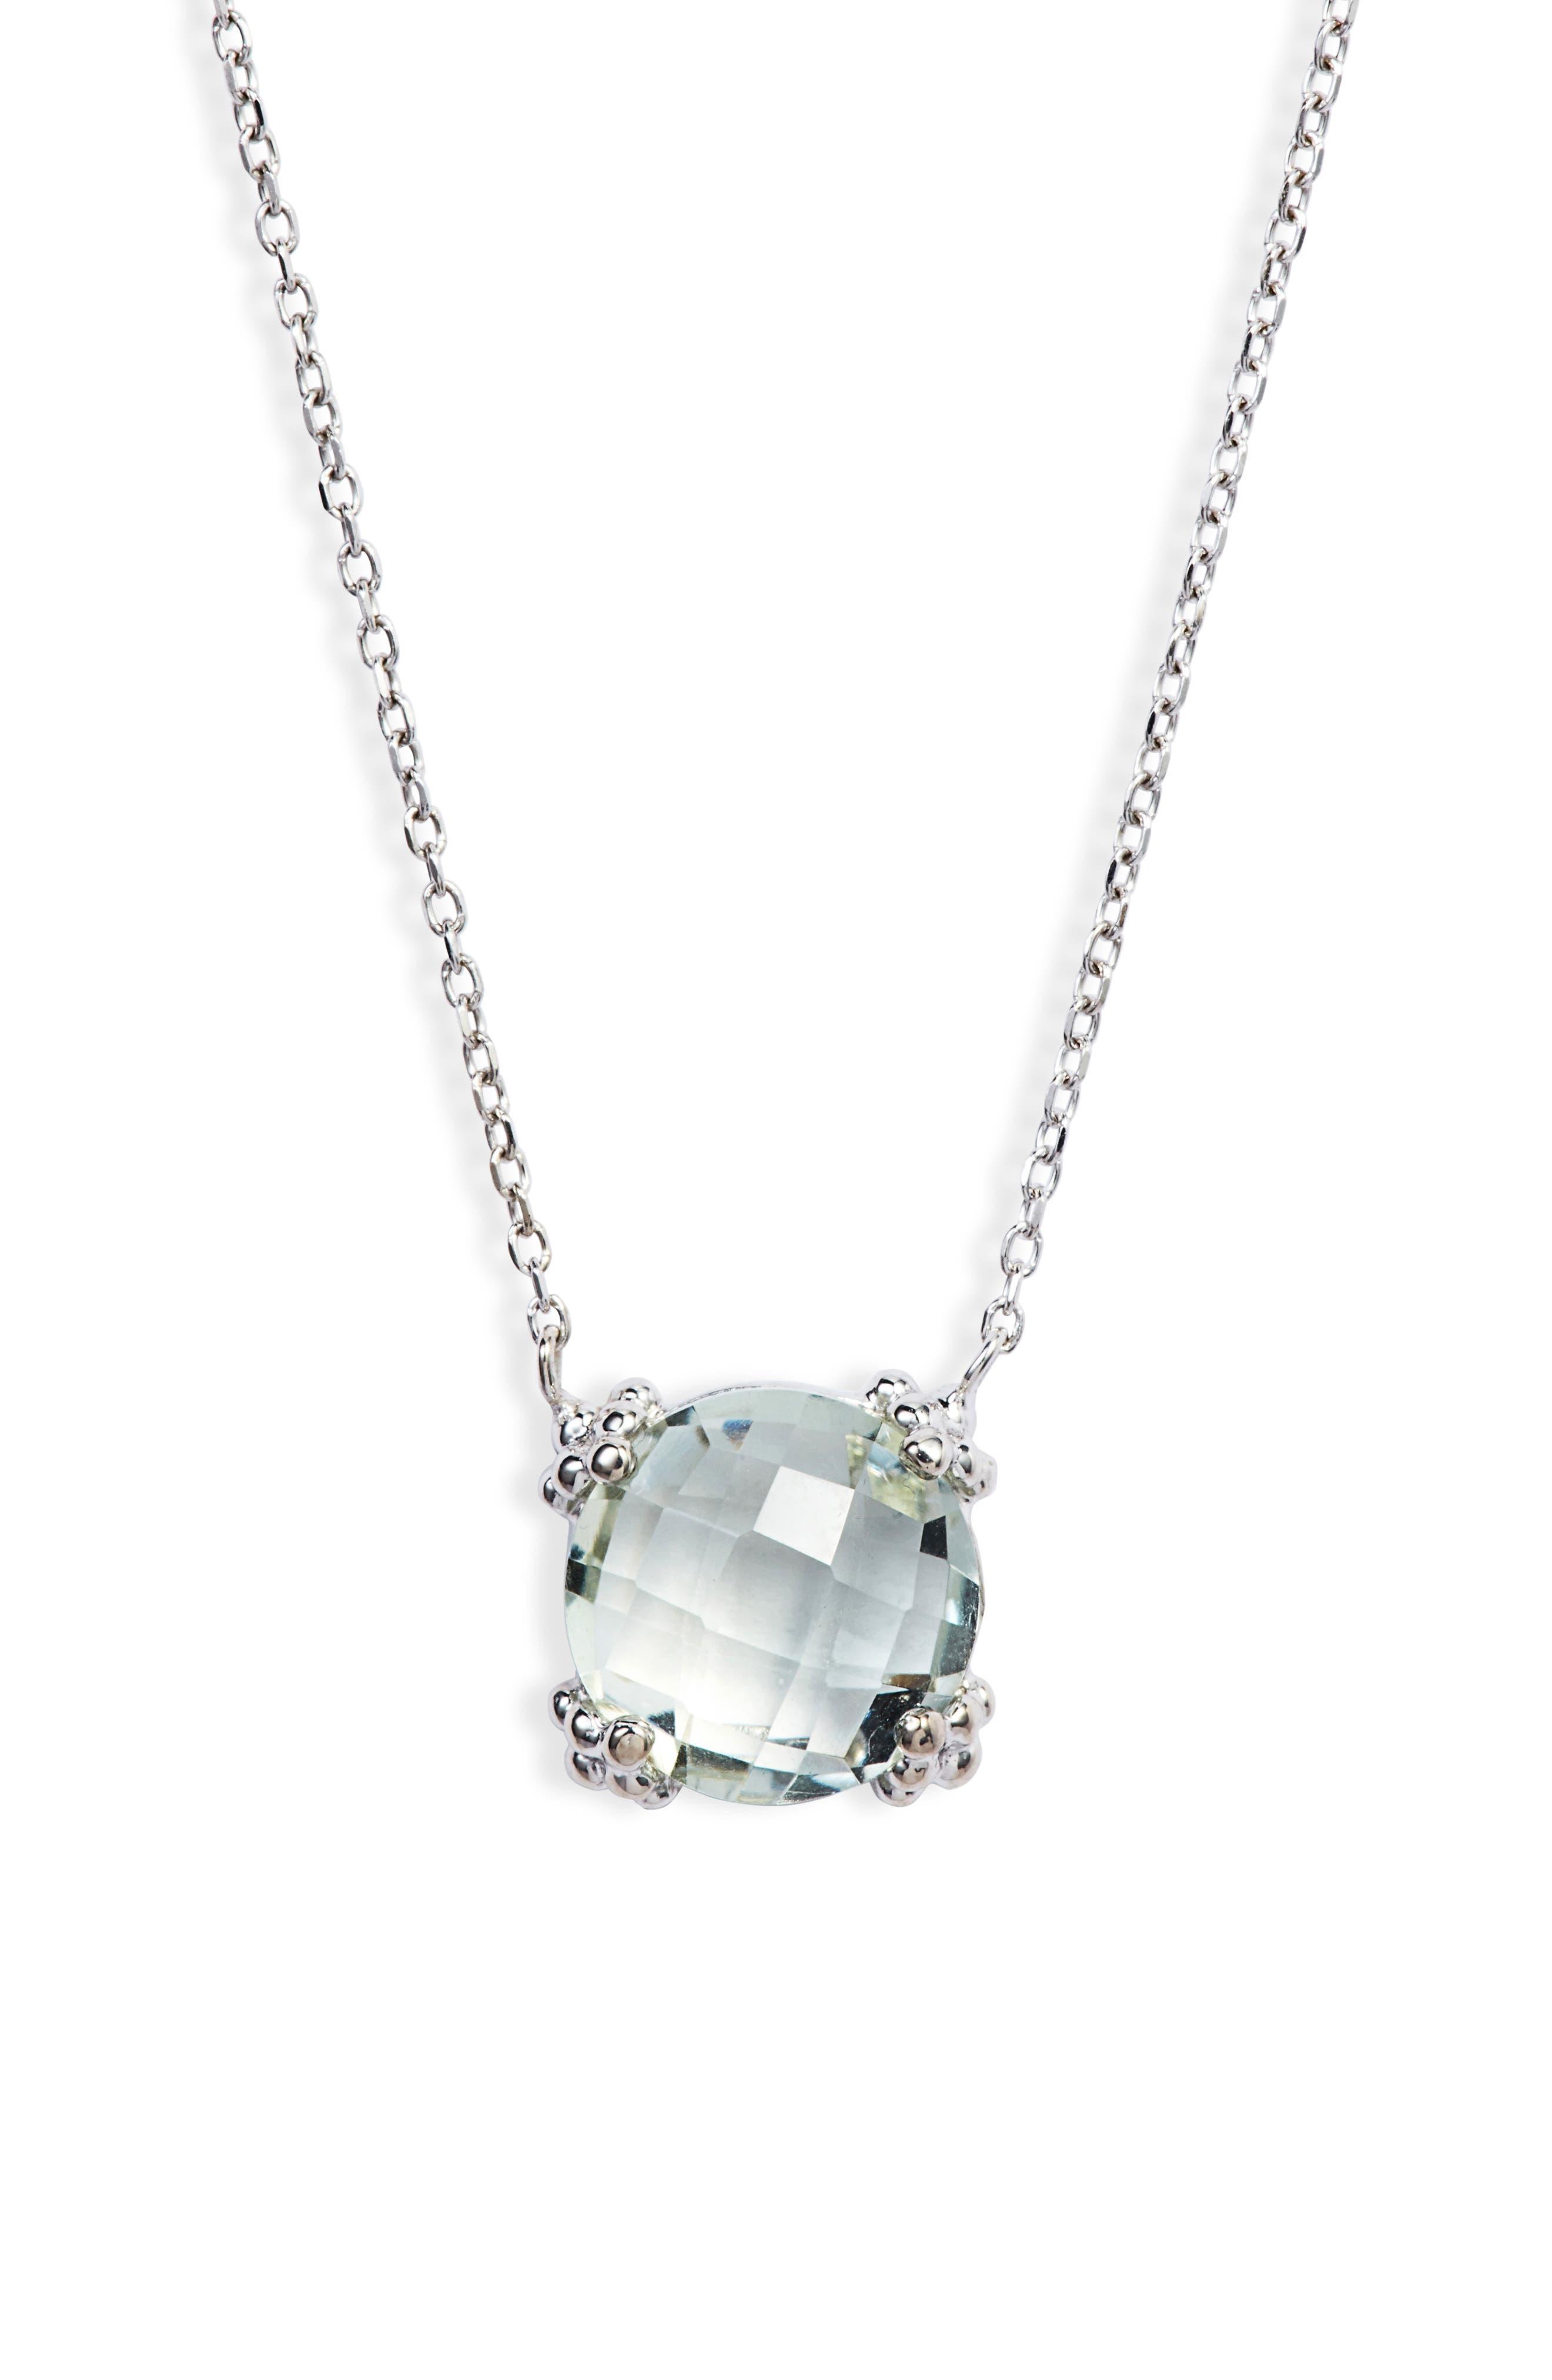 Dew Drop Cluster Topaz Pendant Necklace,                             Main thumbnail 1, color,                             GREEN AMETHYST